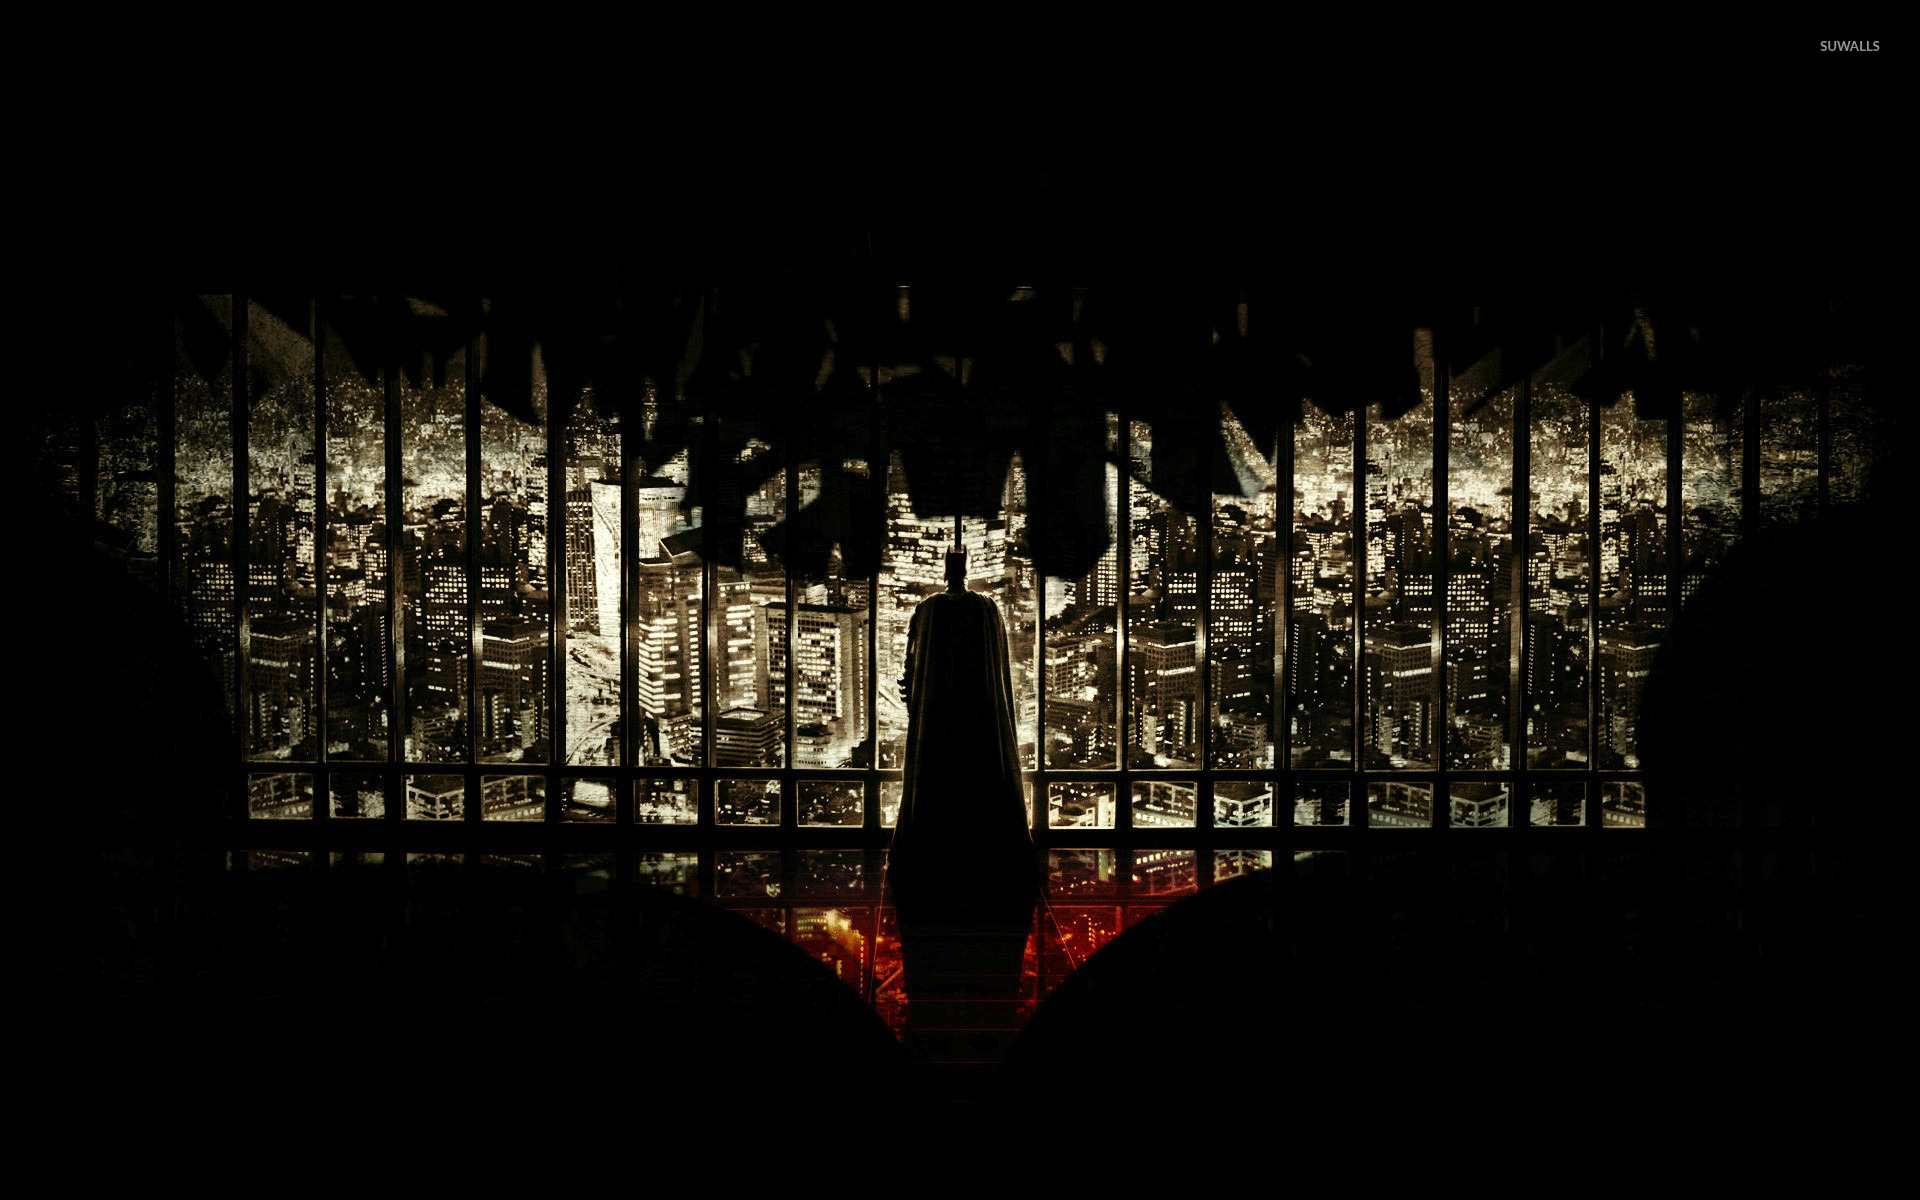 batman - the dark knight rises [2] wallpaper - movie wallpapers - #14639